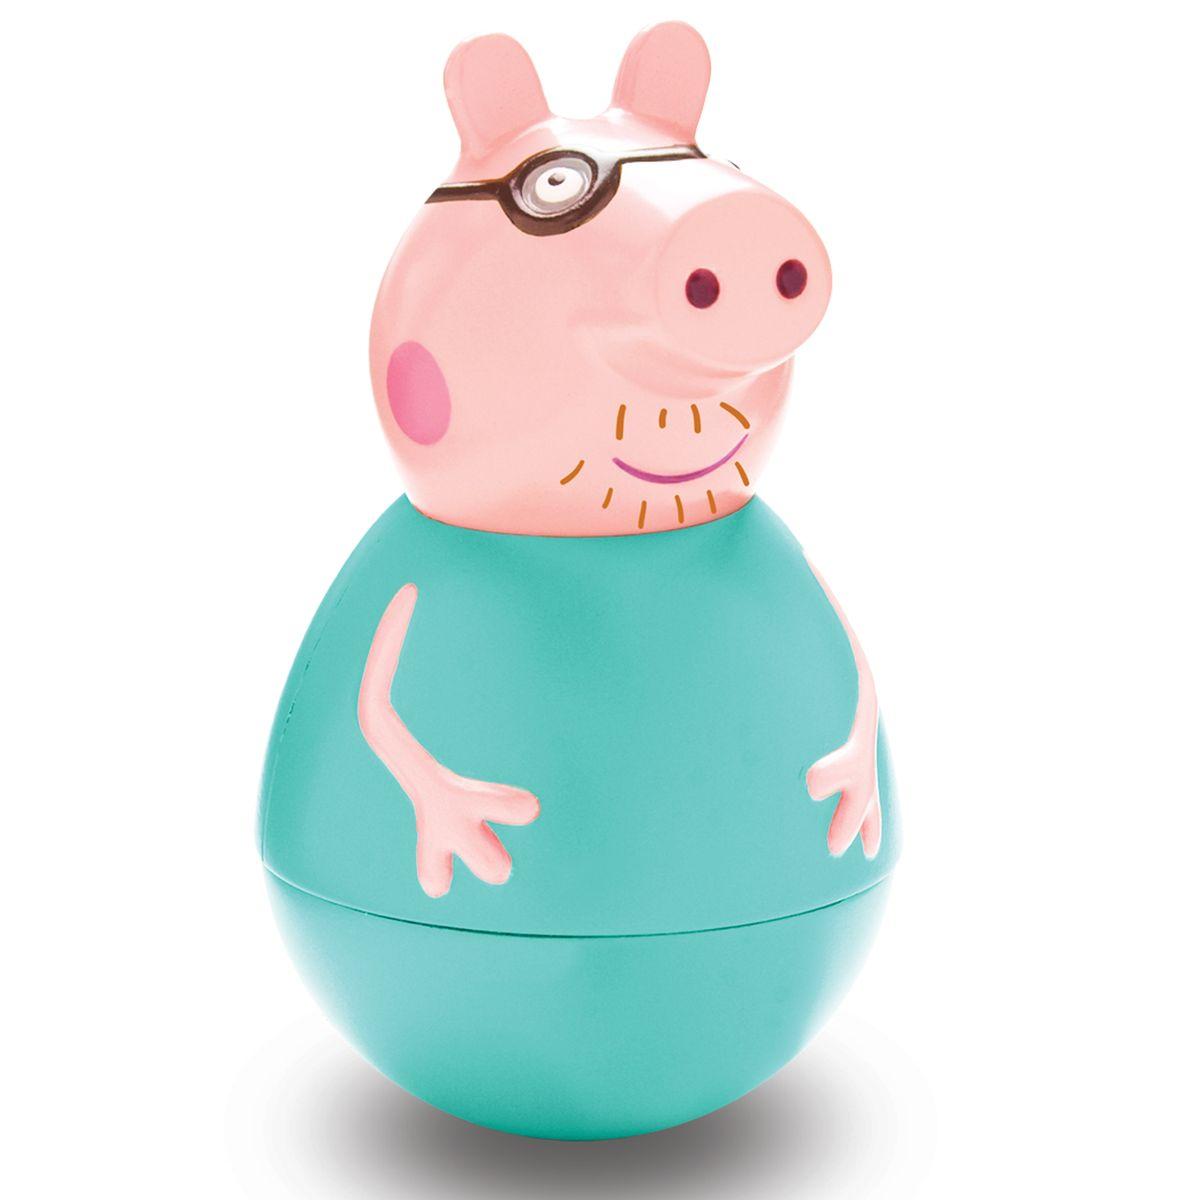 Peppa Pig Неваляшка Папа Пеппы неваляшка папа свин peppa pig неваляшка папа свин